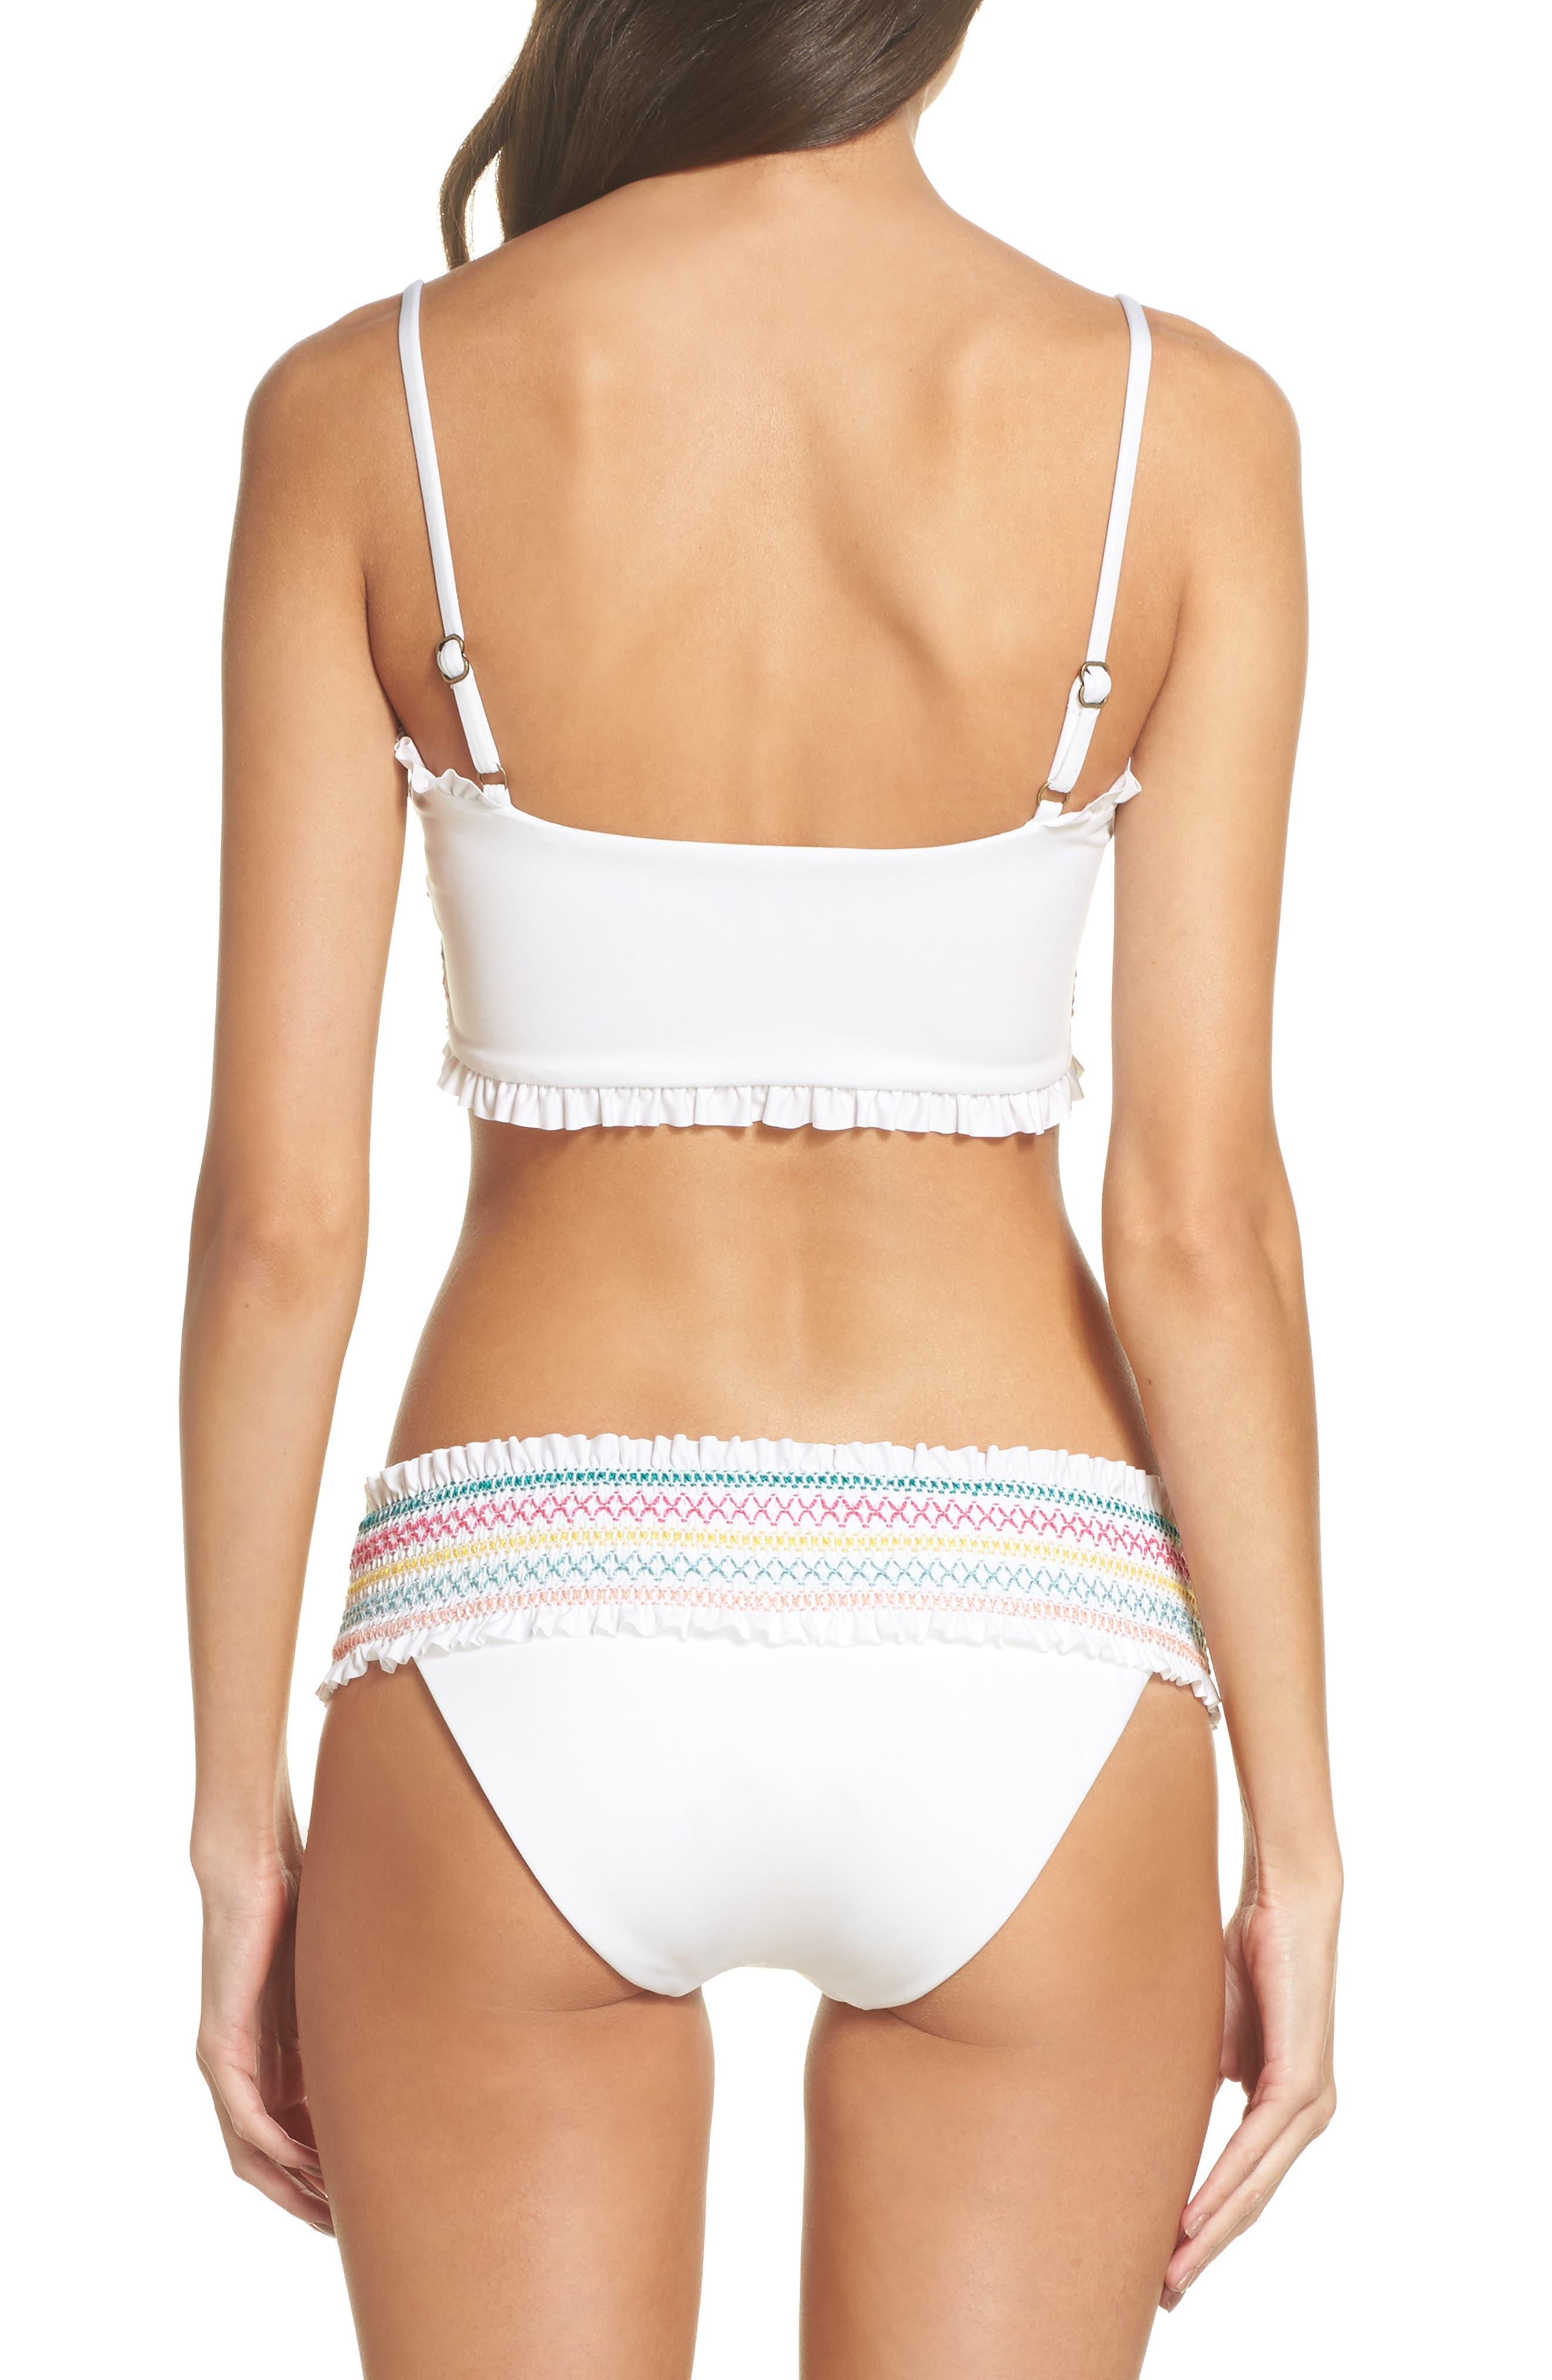 Crystal Cove Smocked Bikini Bottoms,                             Alternate thumbnail 6, color,                             White